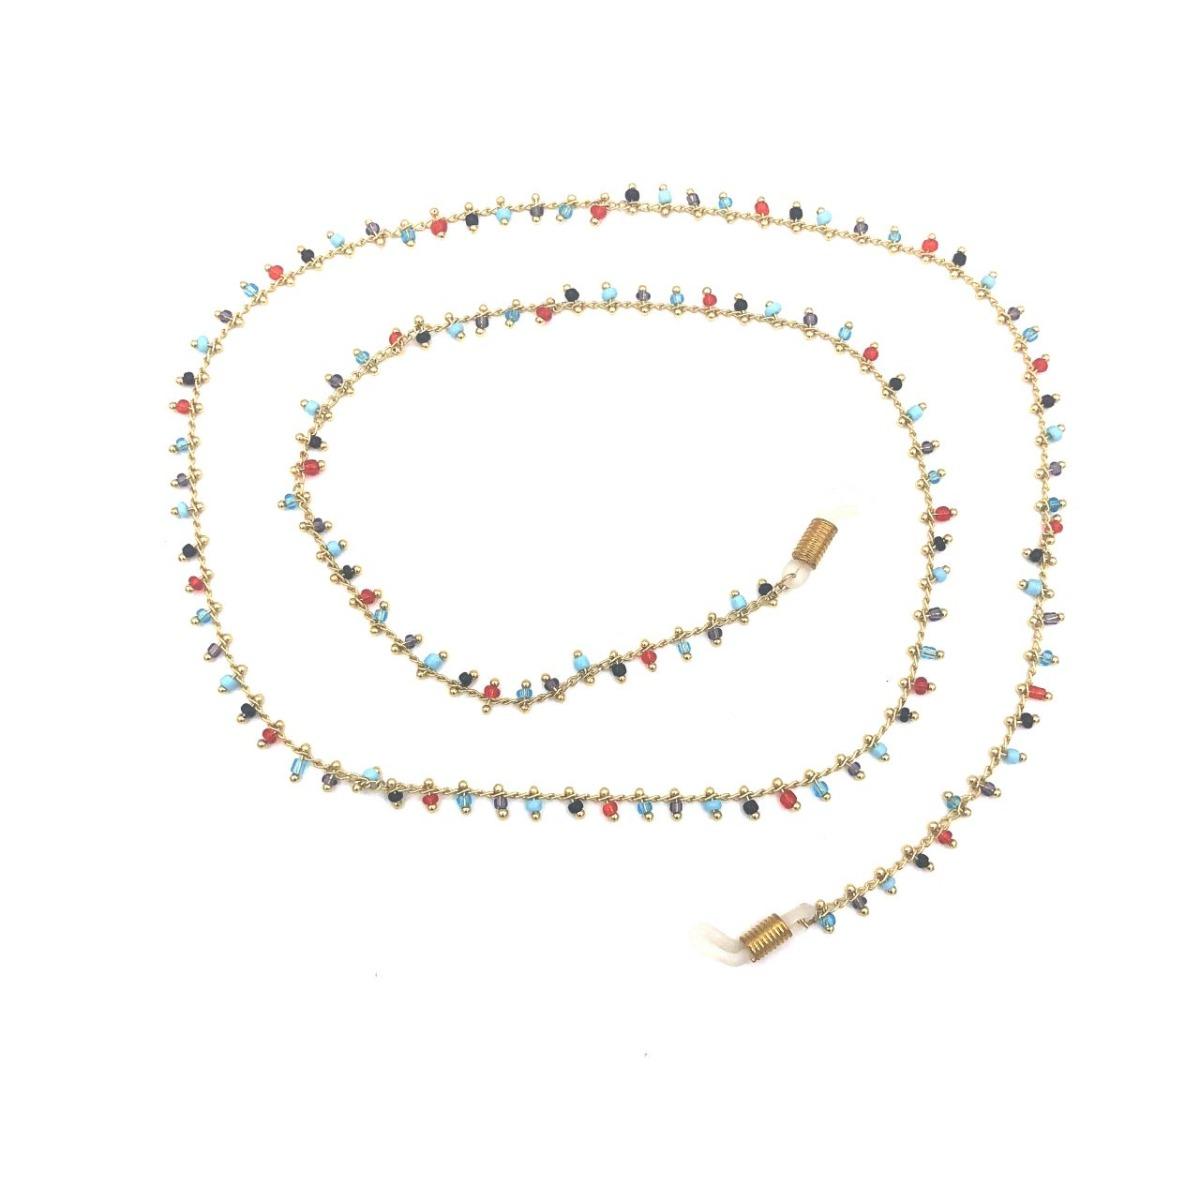 Boho Beach Sunny Necklace – Colourful Stones Mix Chain | 7446023678629